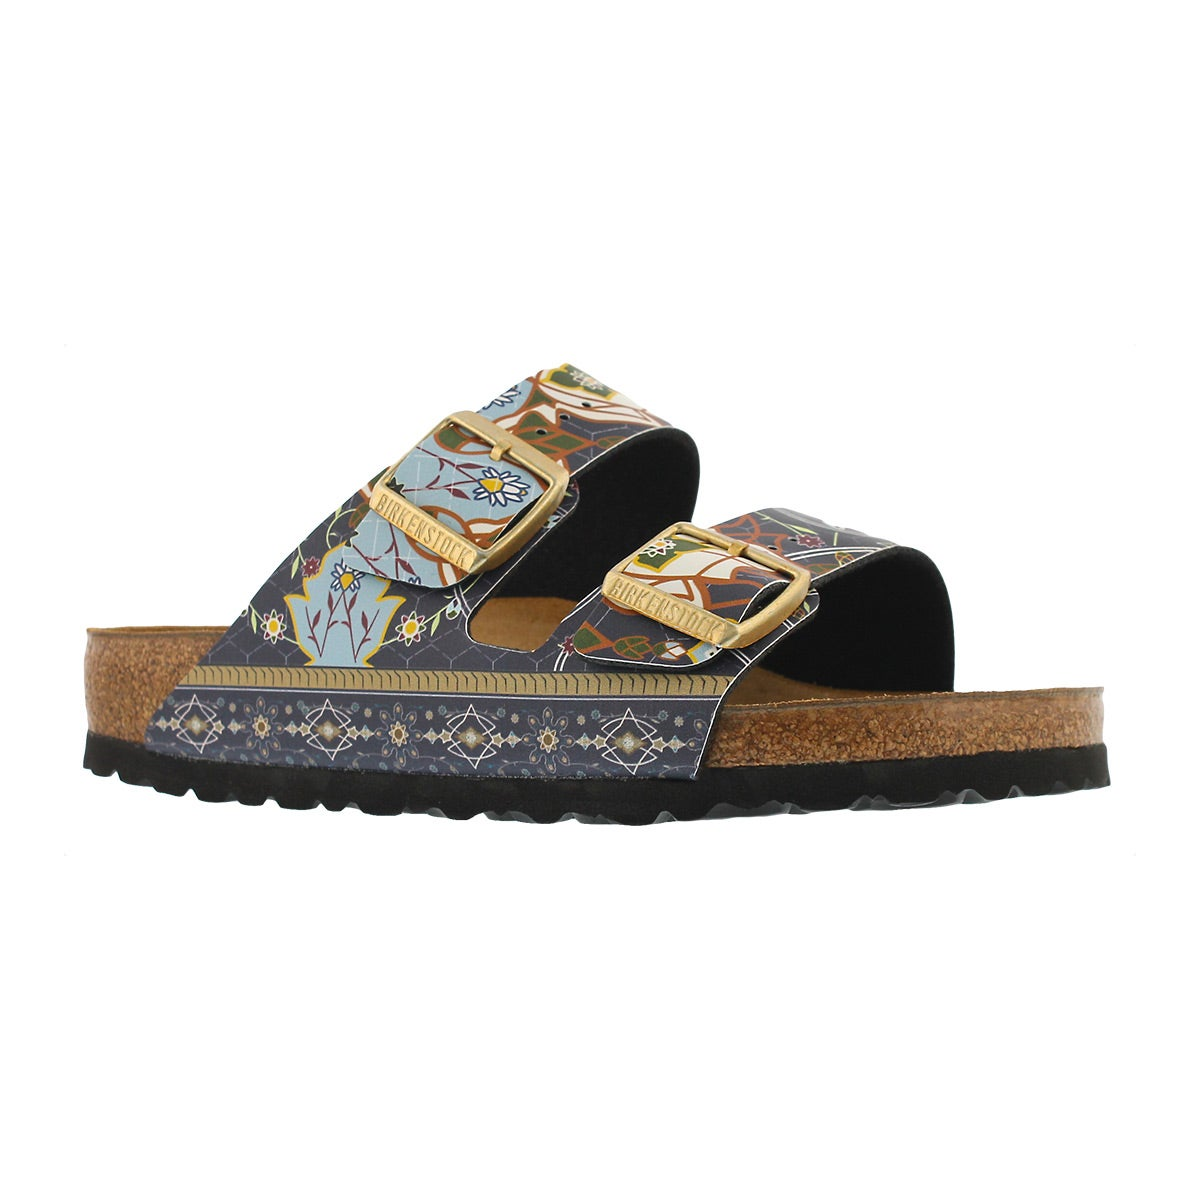 Women's ARIZONA BF ancient mosaic blu sandals